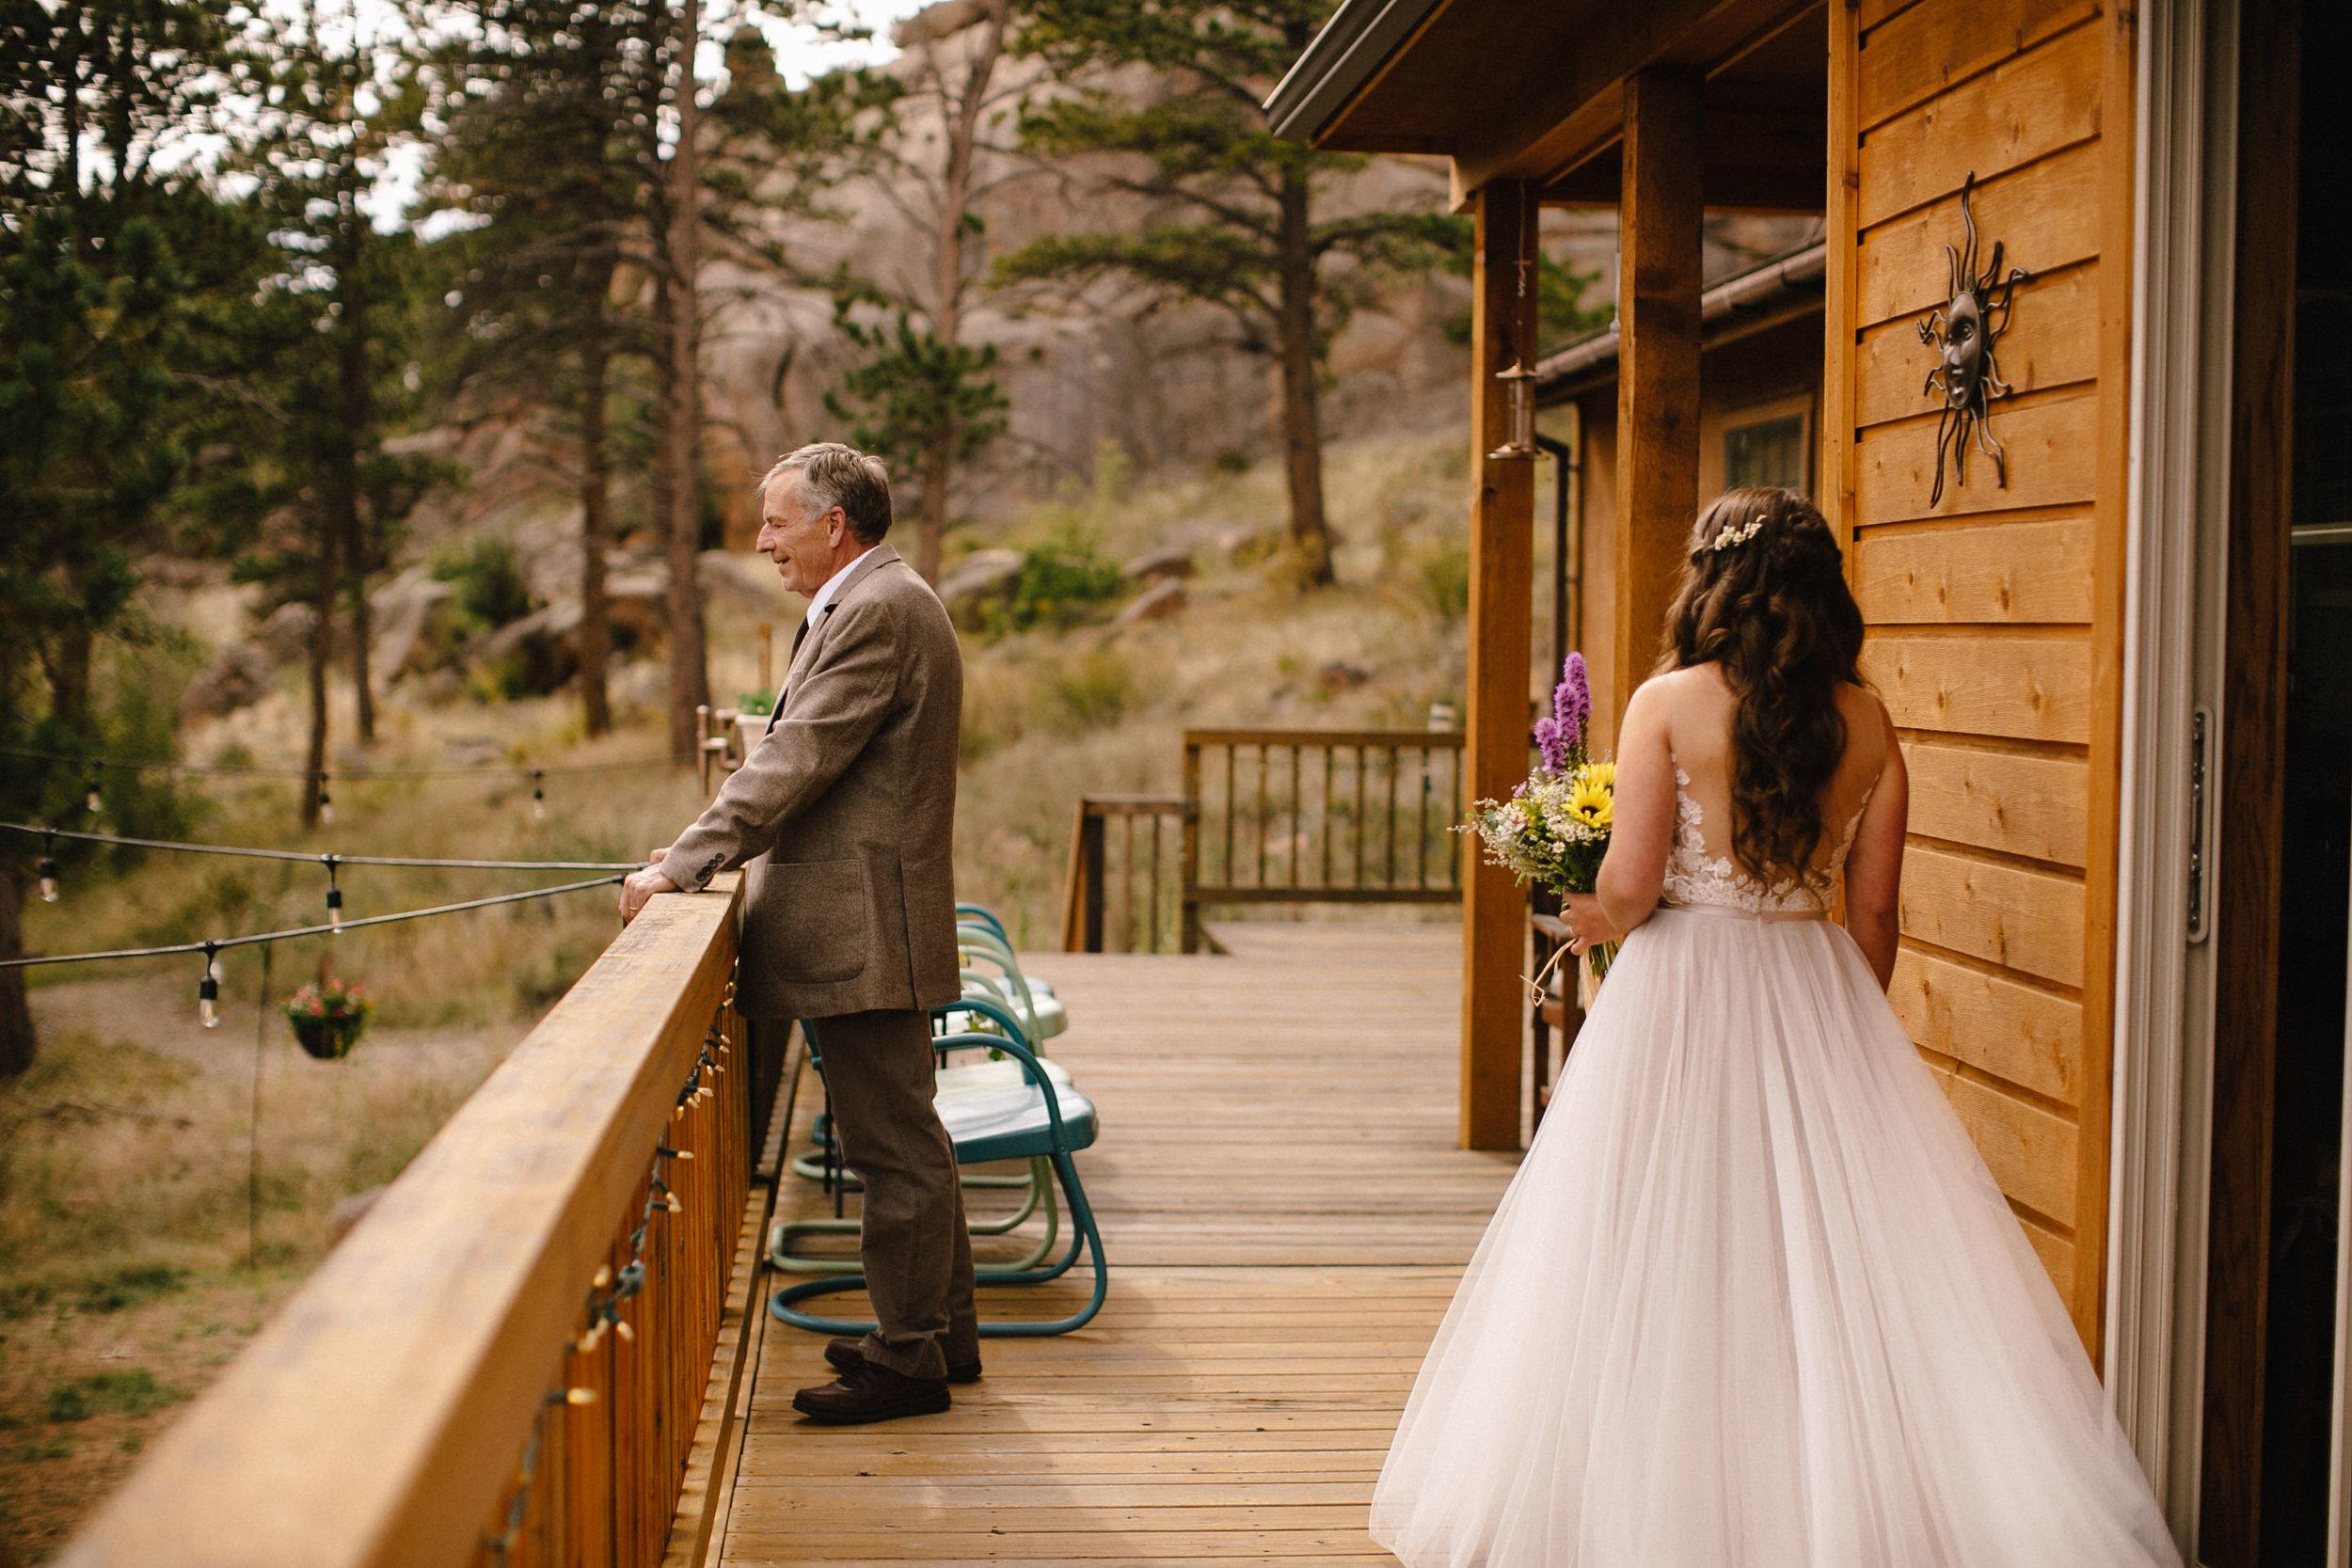 Liz Osban Photography Vedauwoo Buford Wyoming Happy Jack Wedding Elopement Destination Small Forest Cheyenne Laramie Medicine Bow National Forest Getting Ready21.jpg